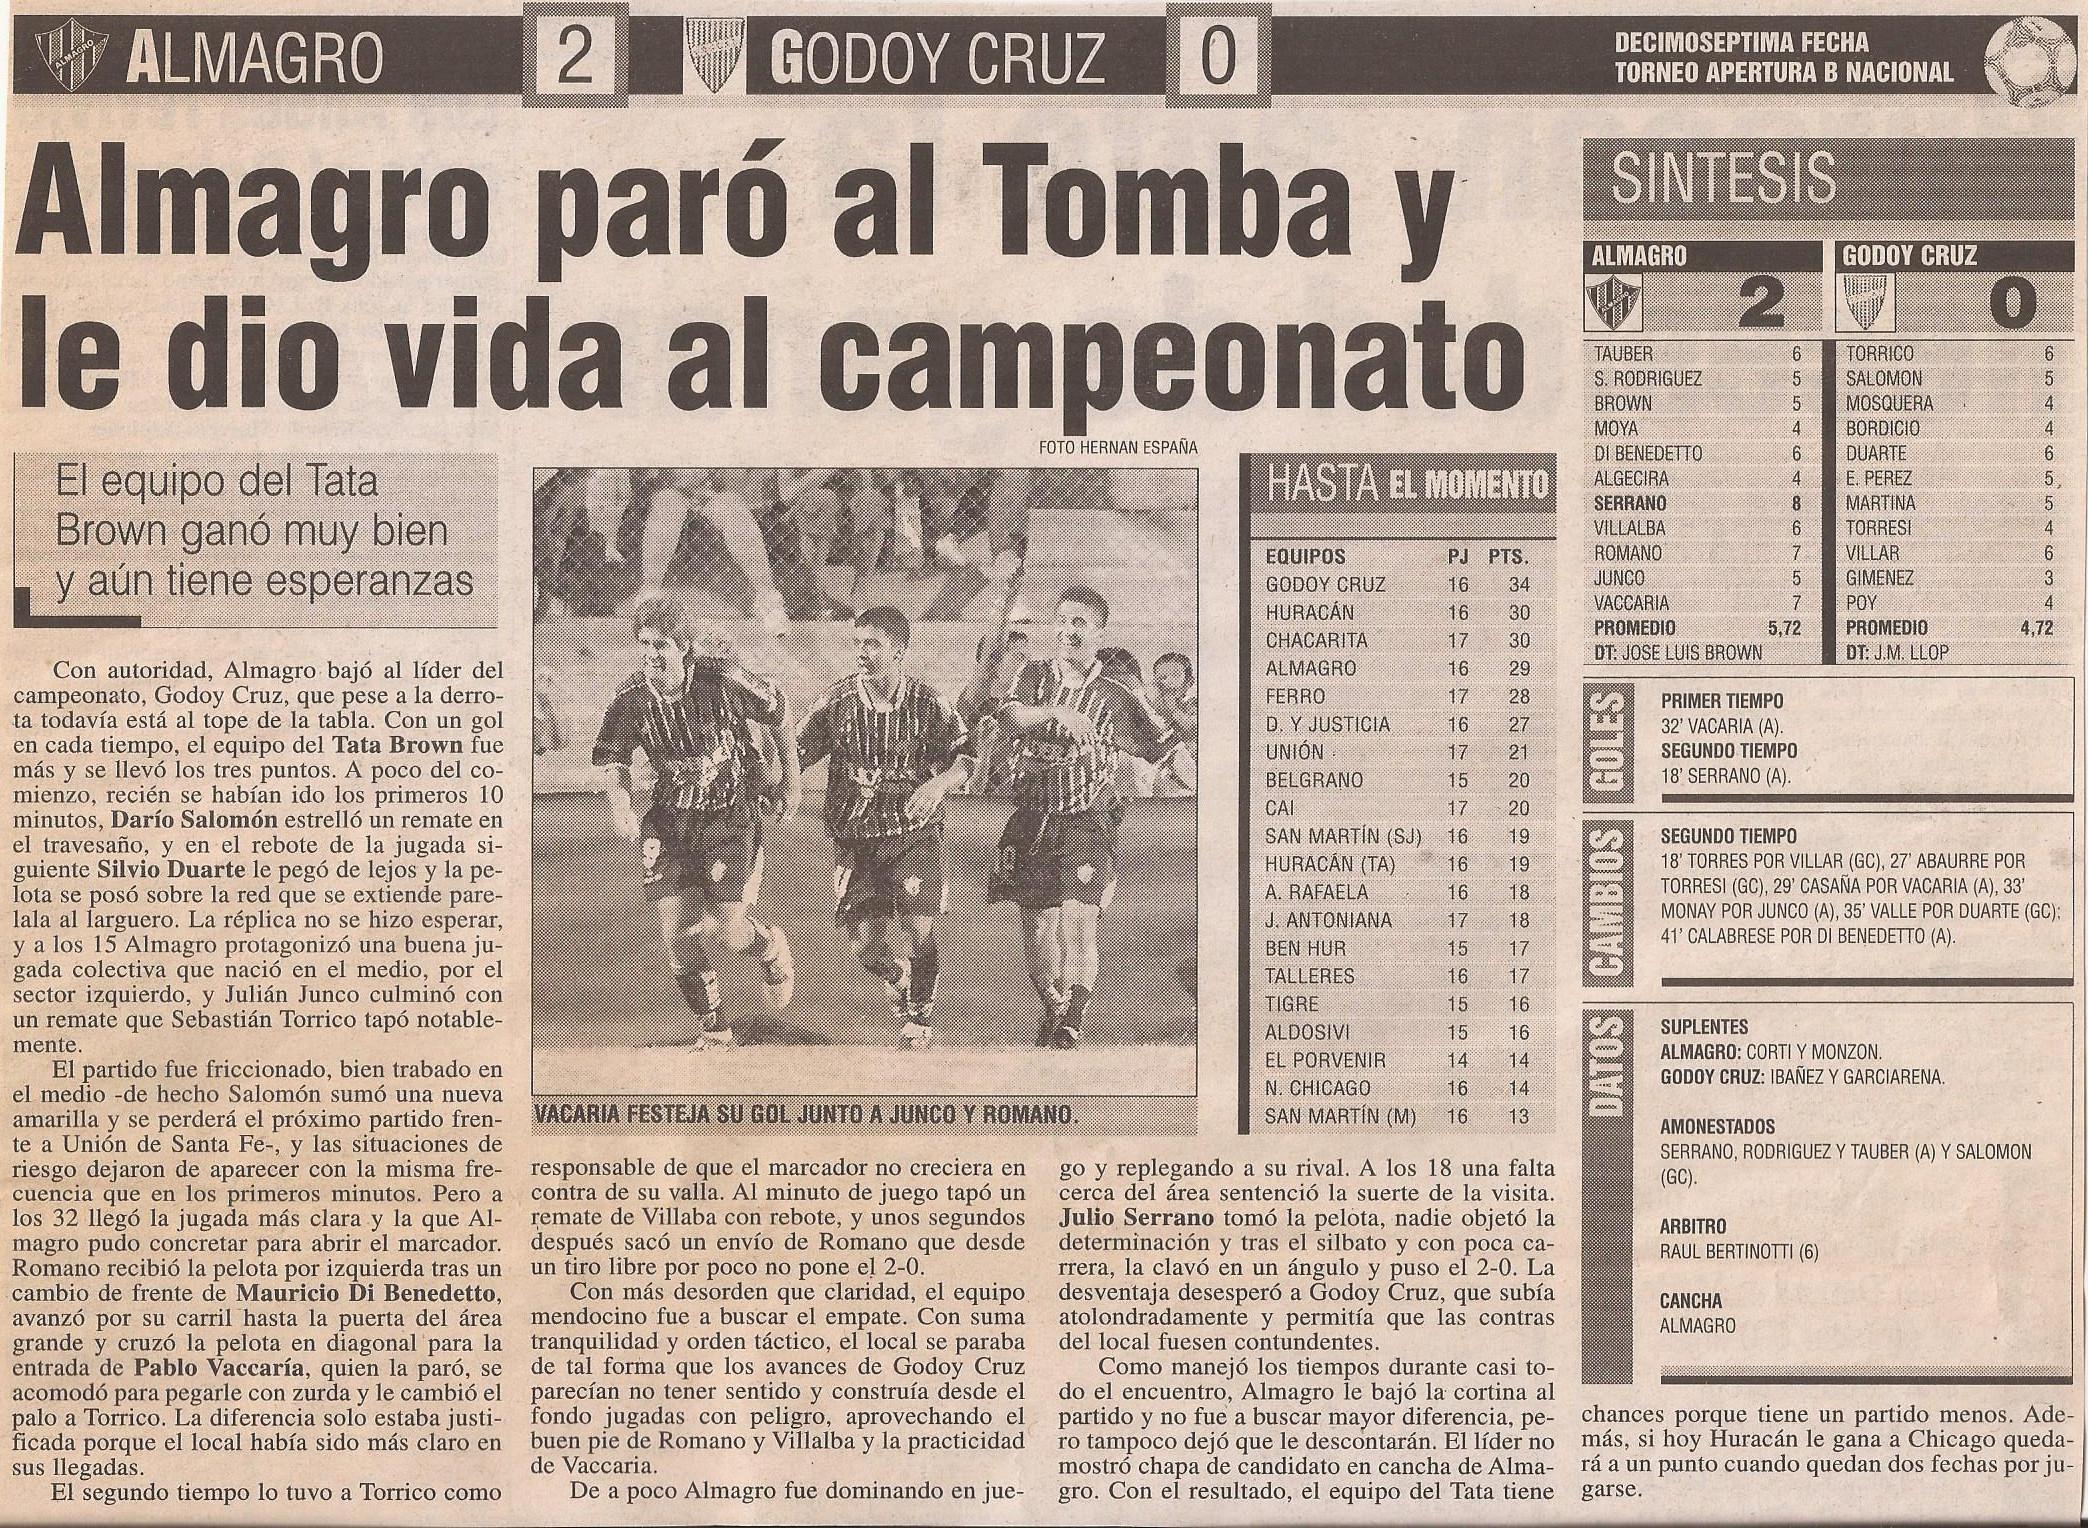 2005-06 Nacional B - Almagro vs Godoy Cruz - Diario Popular